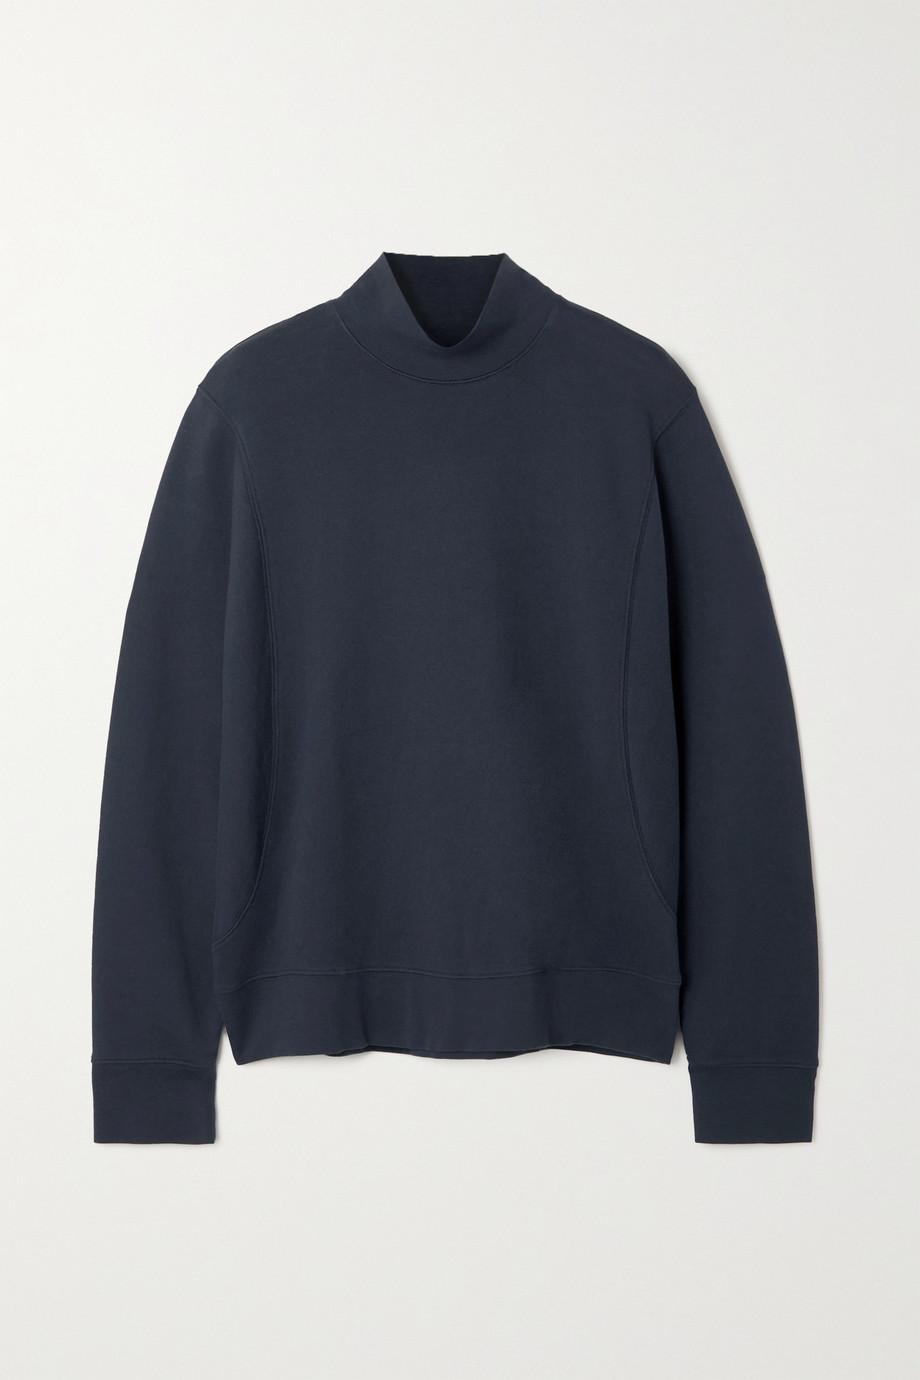 Vince Cotton-jersey sweatshirt